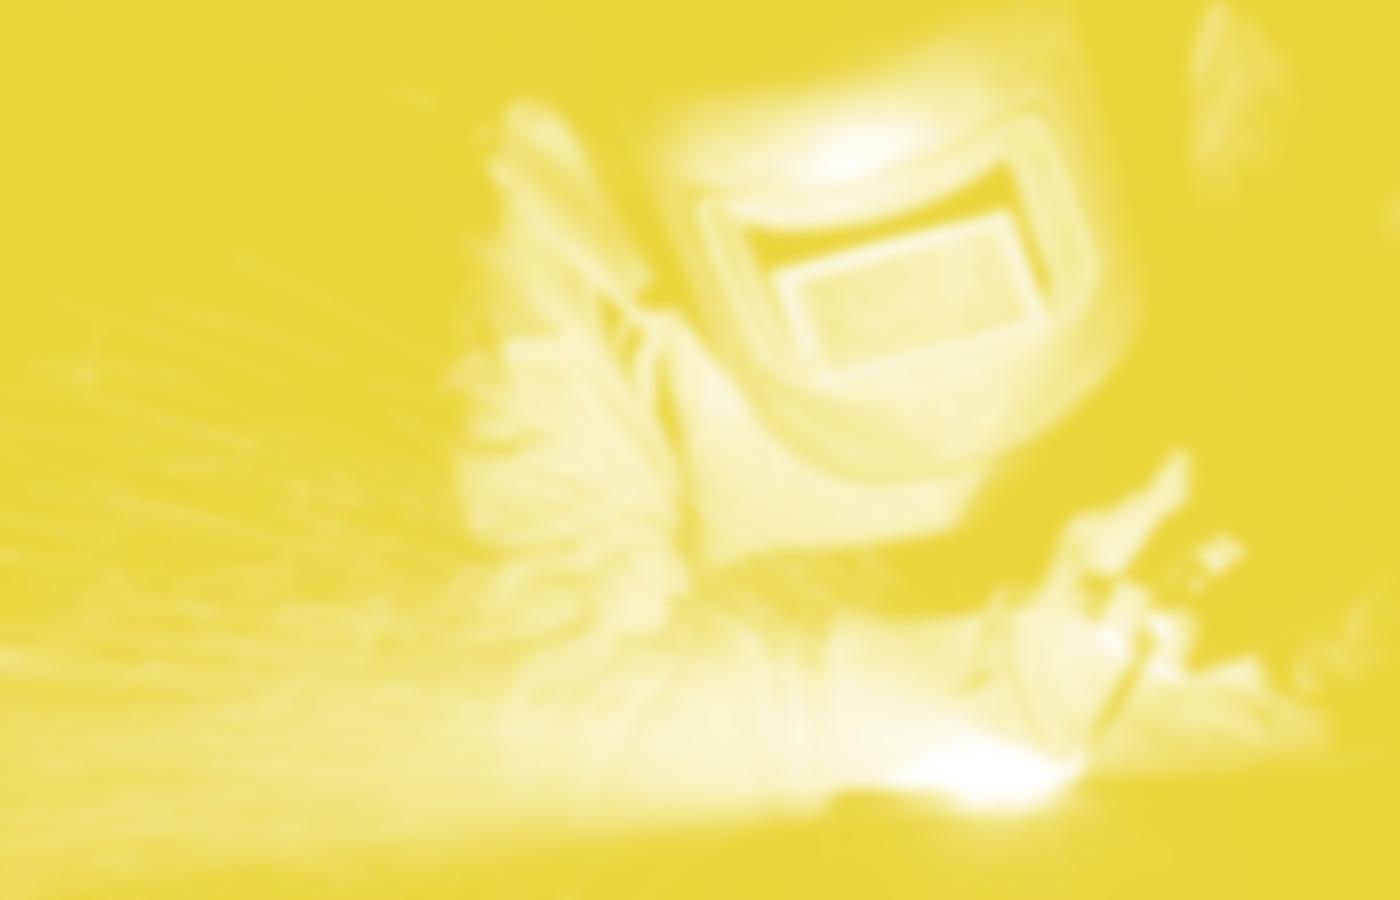 yellow-welder-blur-bg